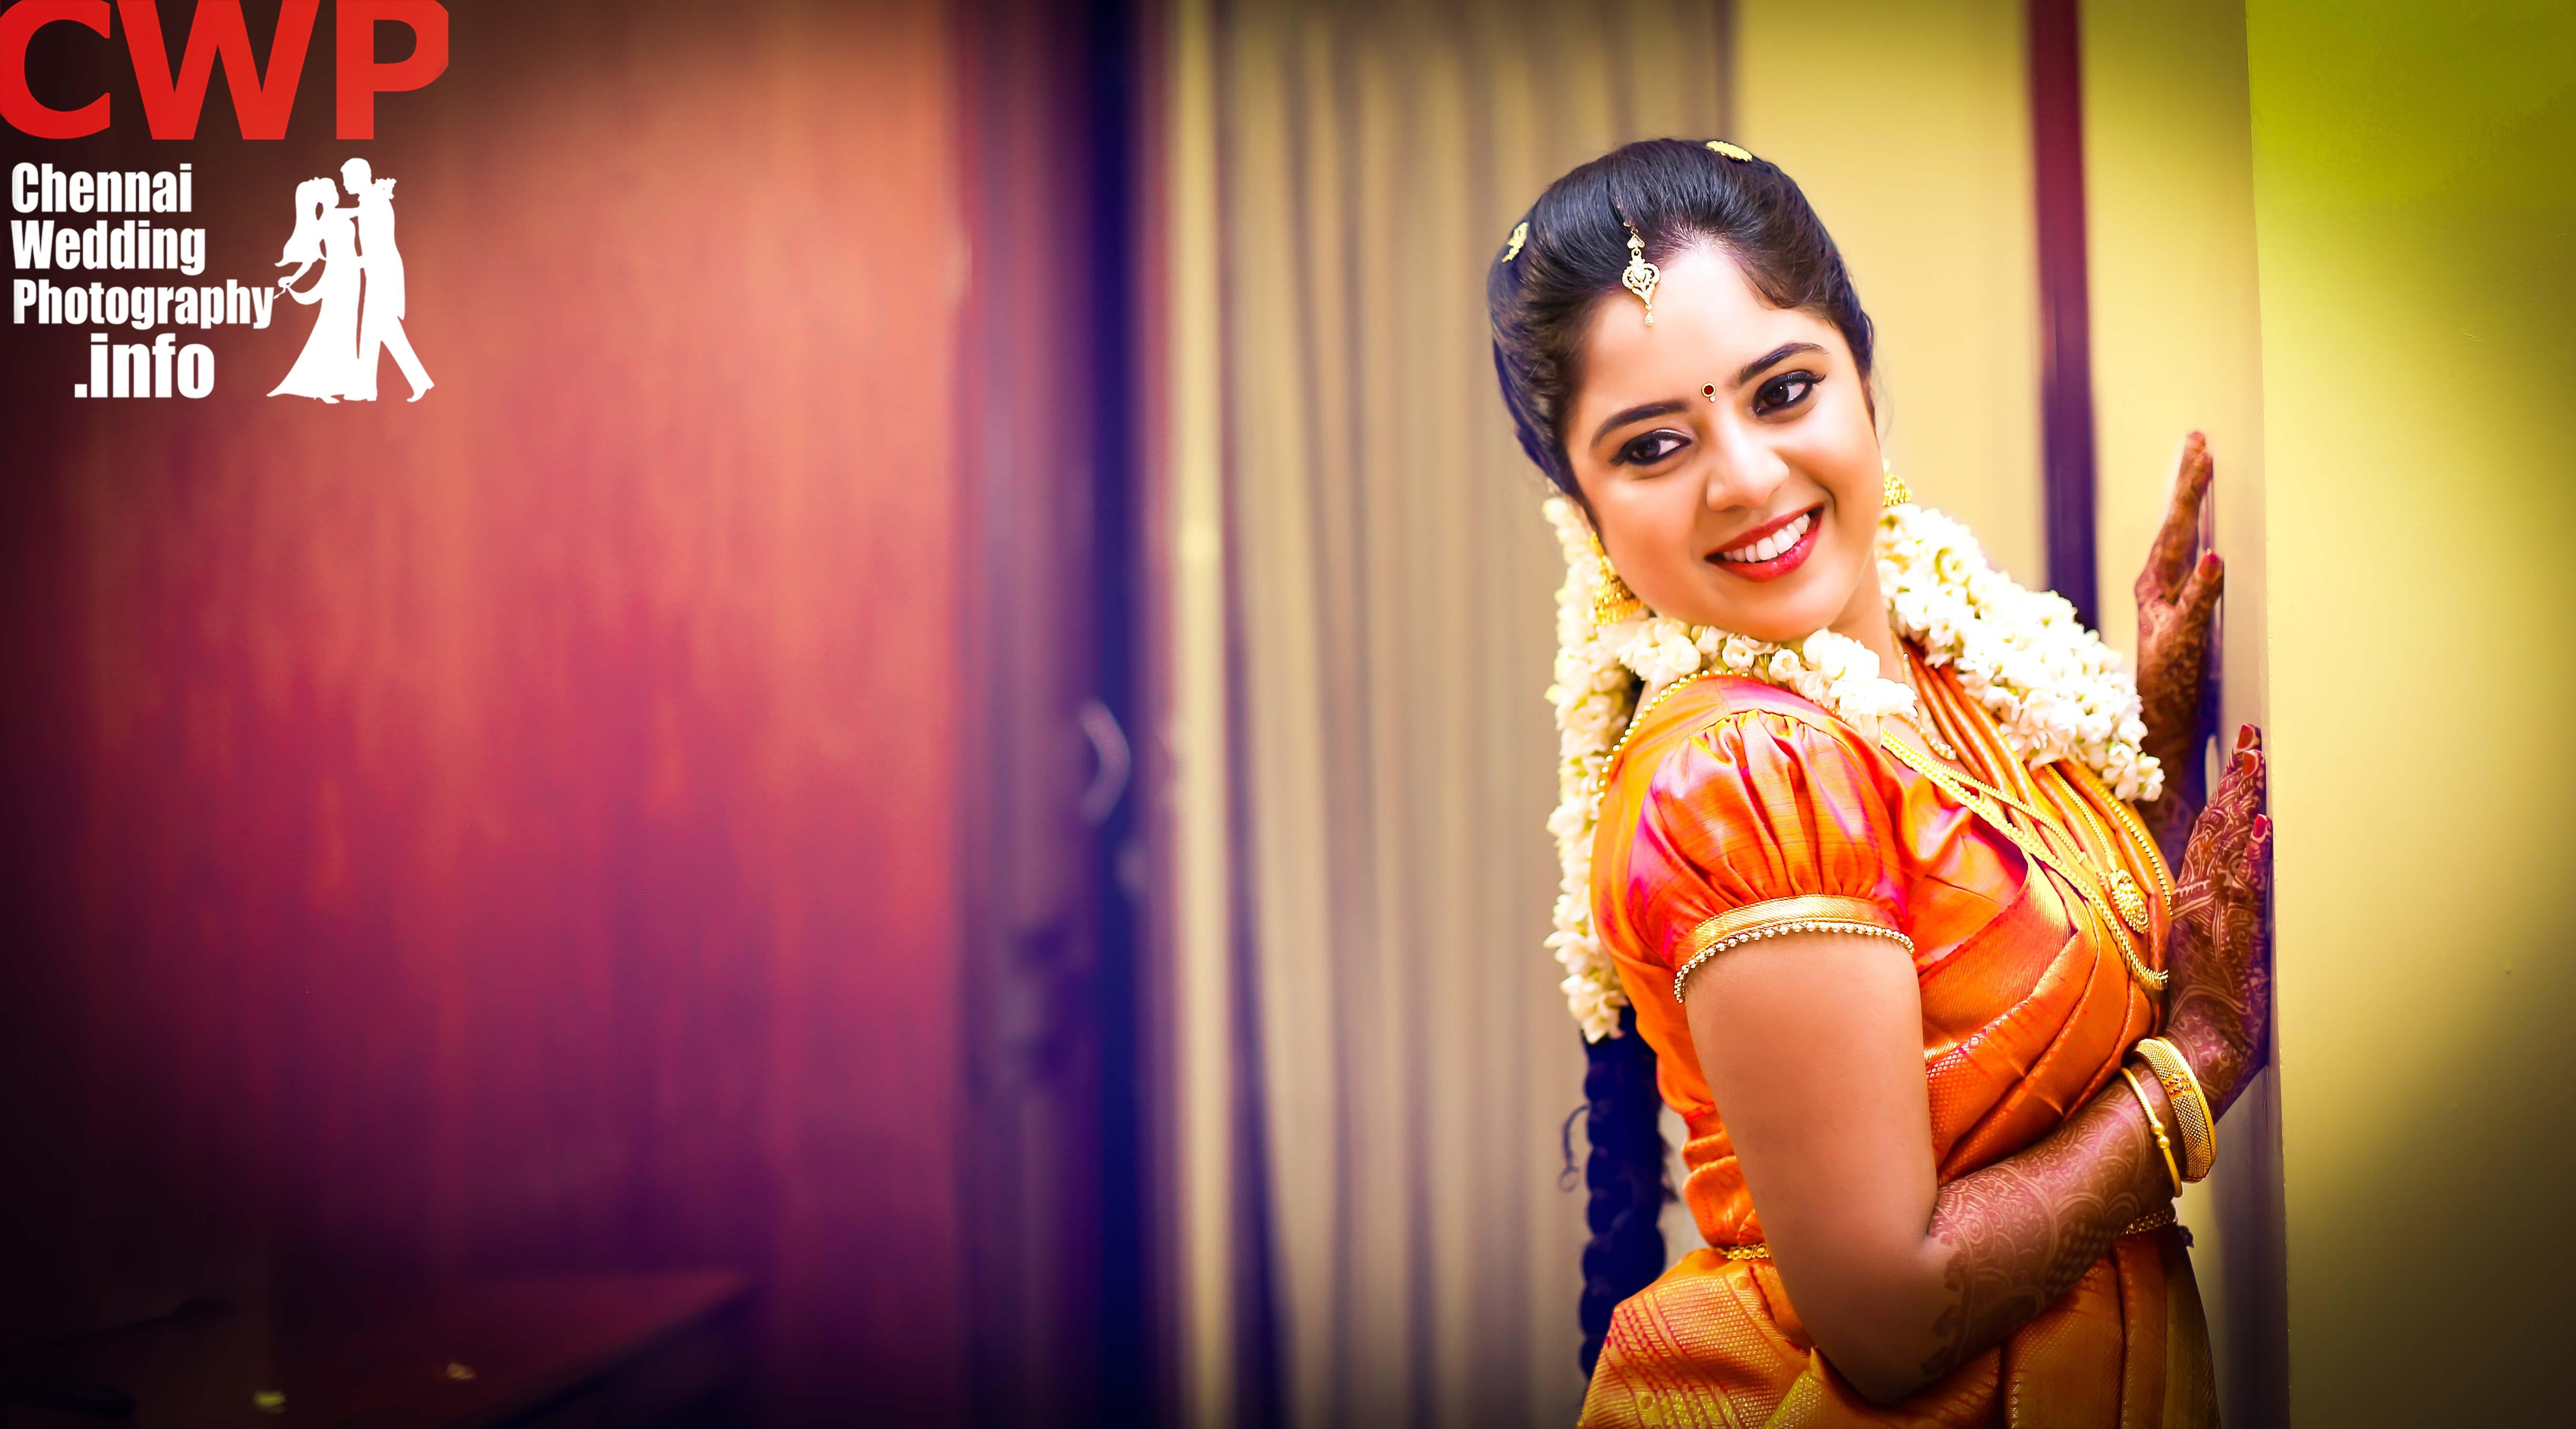 chennaichristianwedding photographer